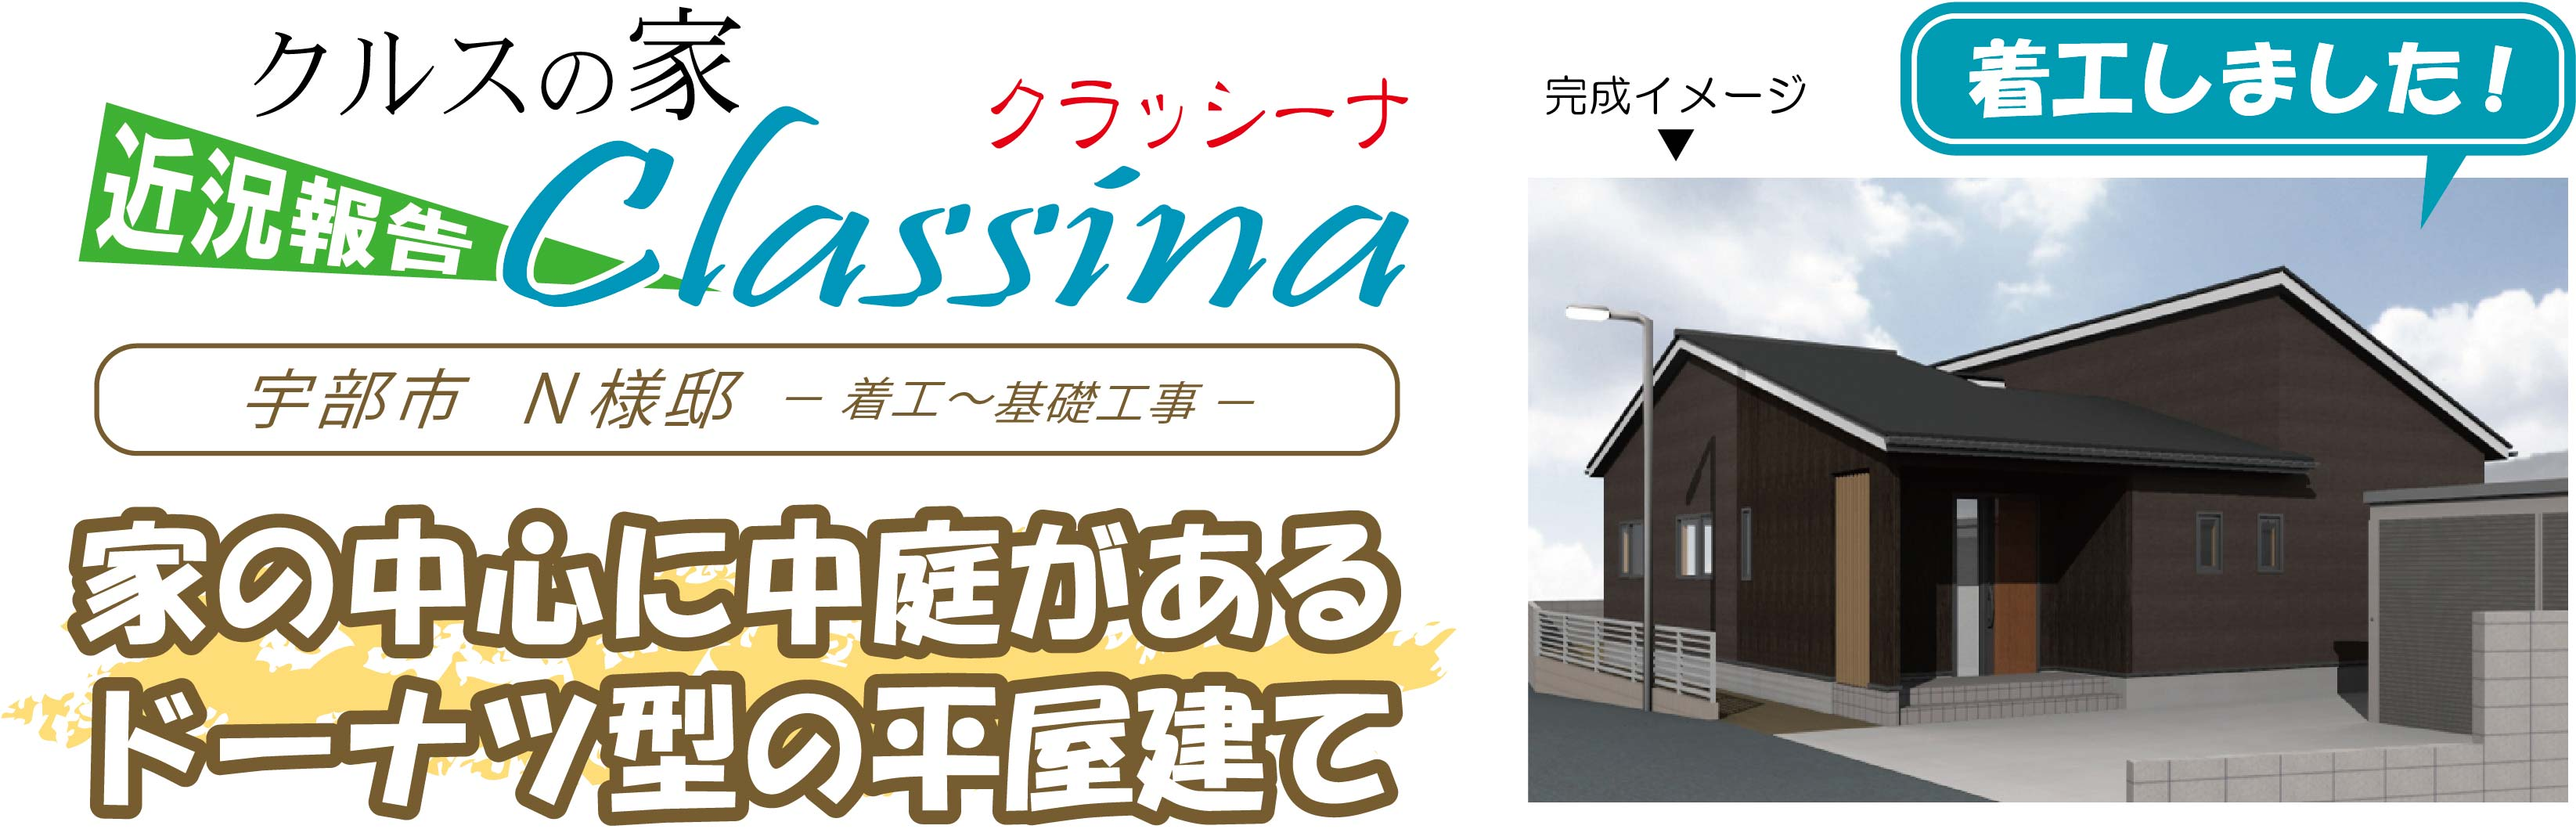 KuraSi-natu-sin86-02.jpg